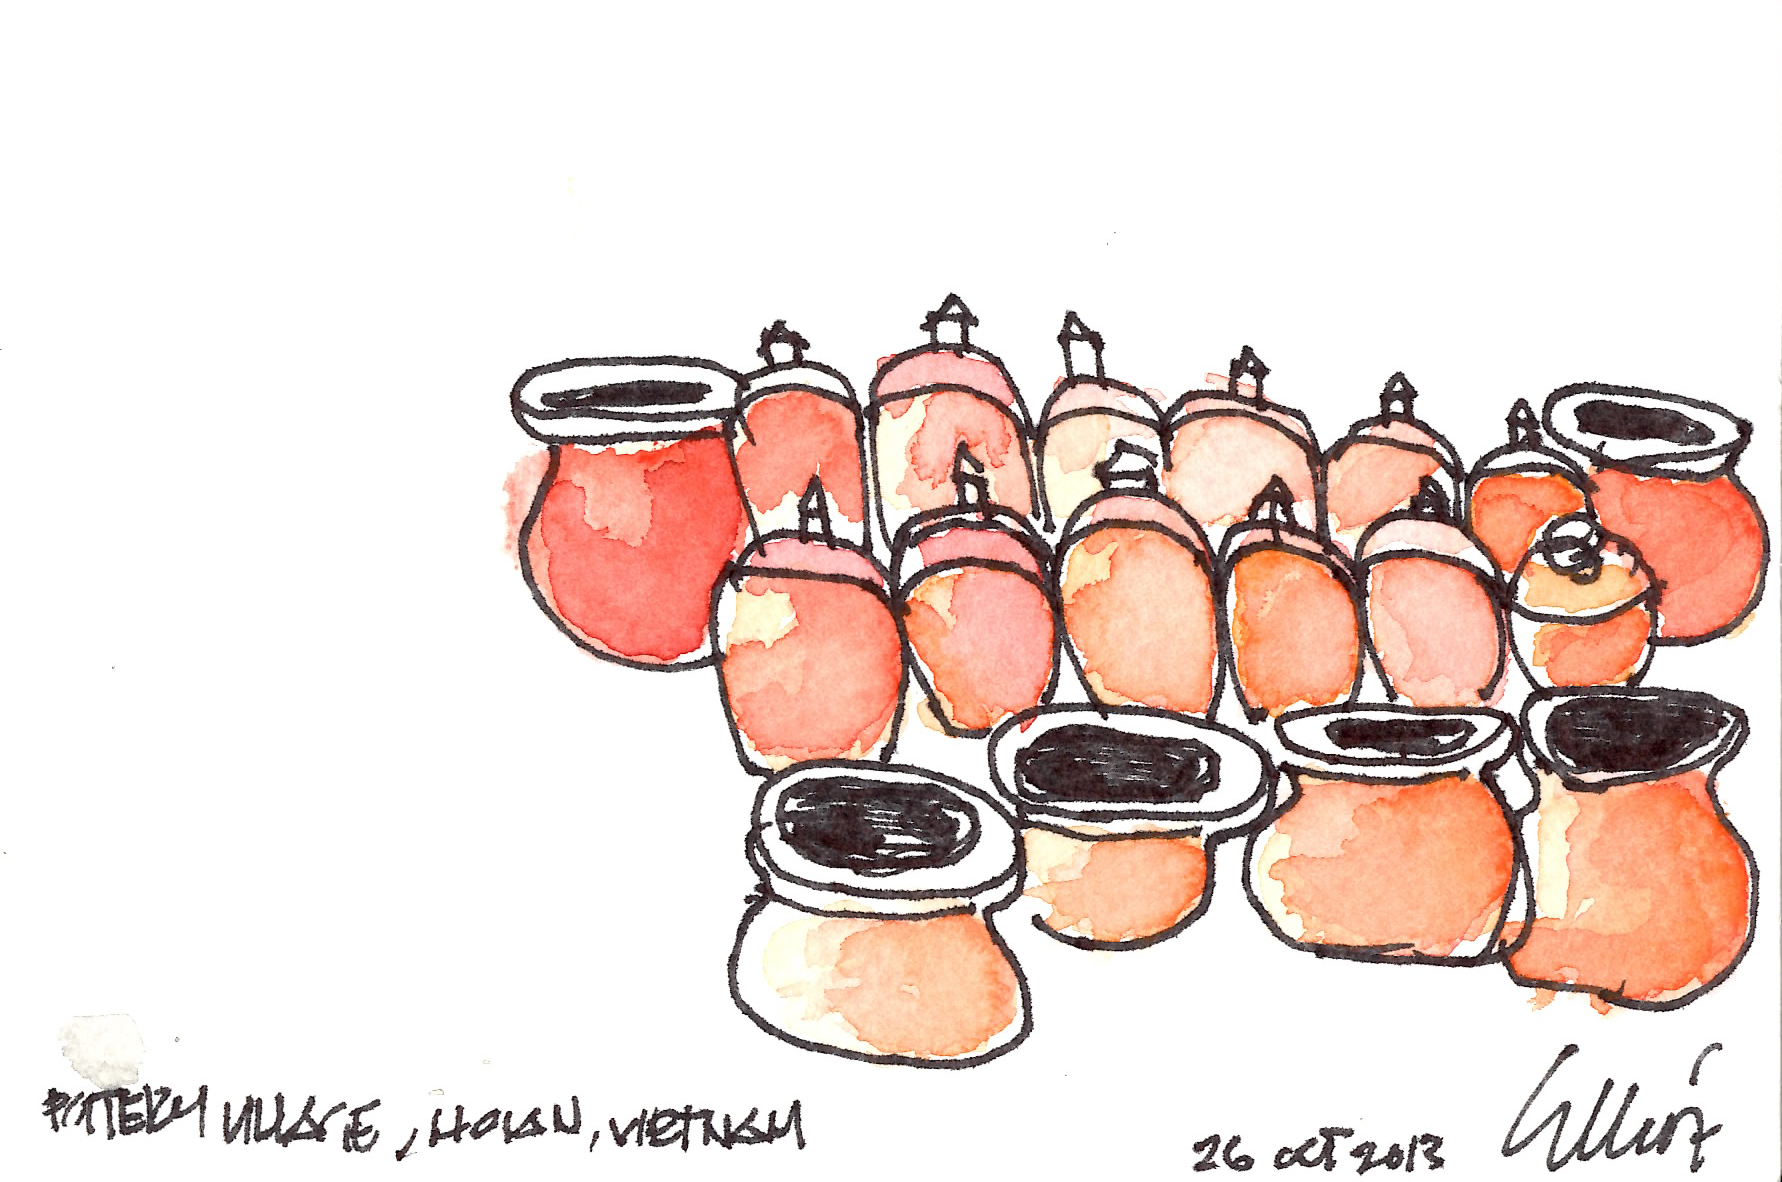 pottery village hoian 10.26.13